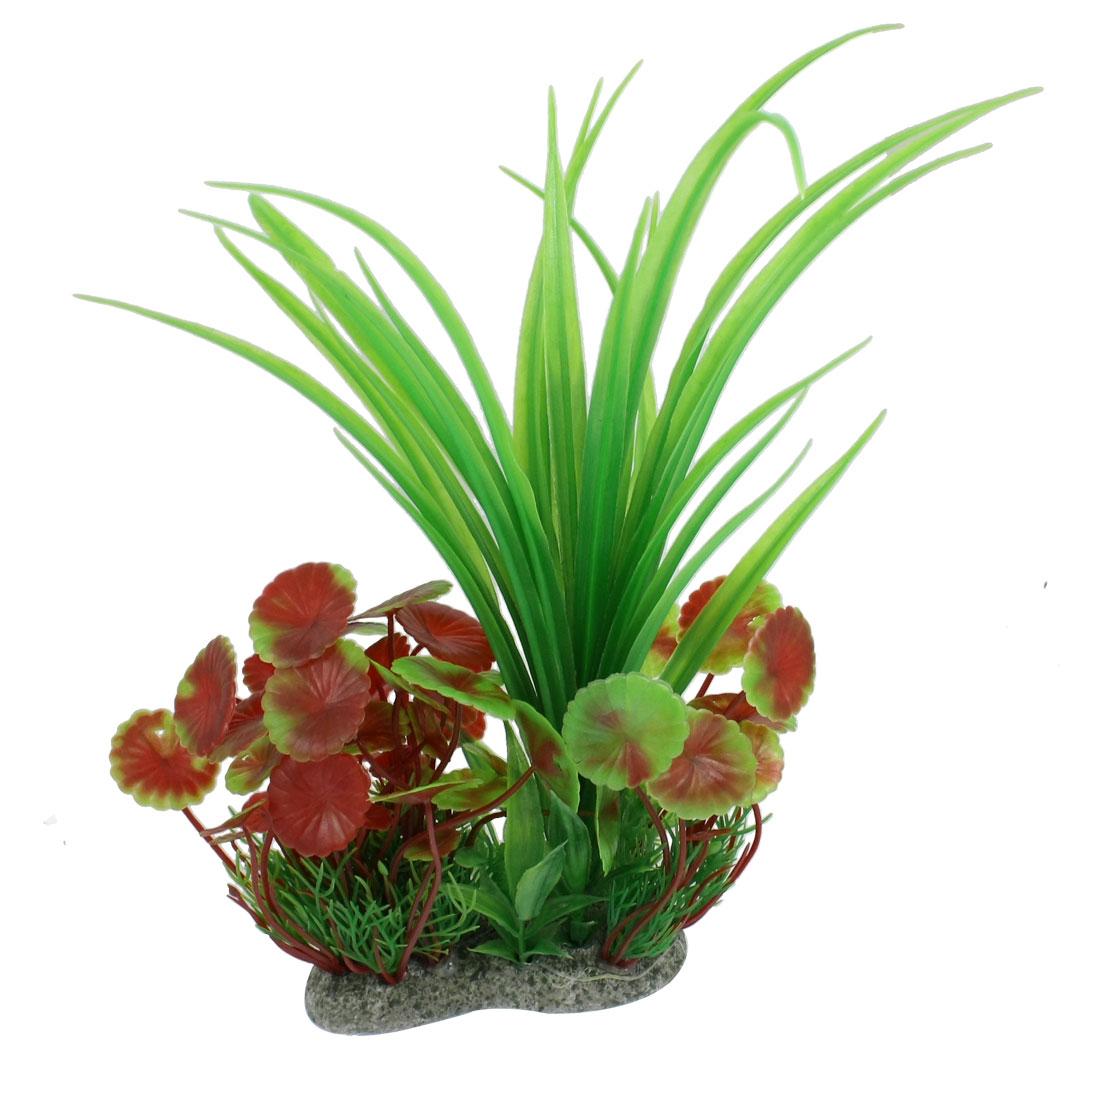 "Fish Aquarium Decoration Plastic Green Red Grass Plant 10.6"" Height"